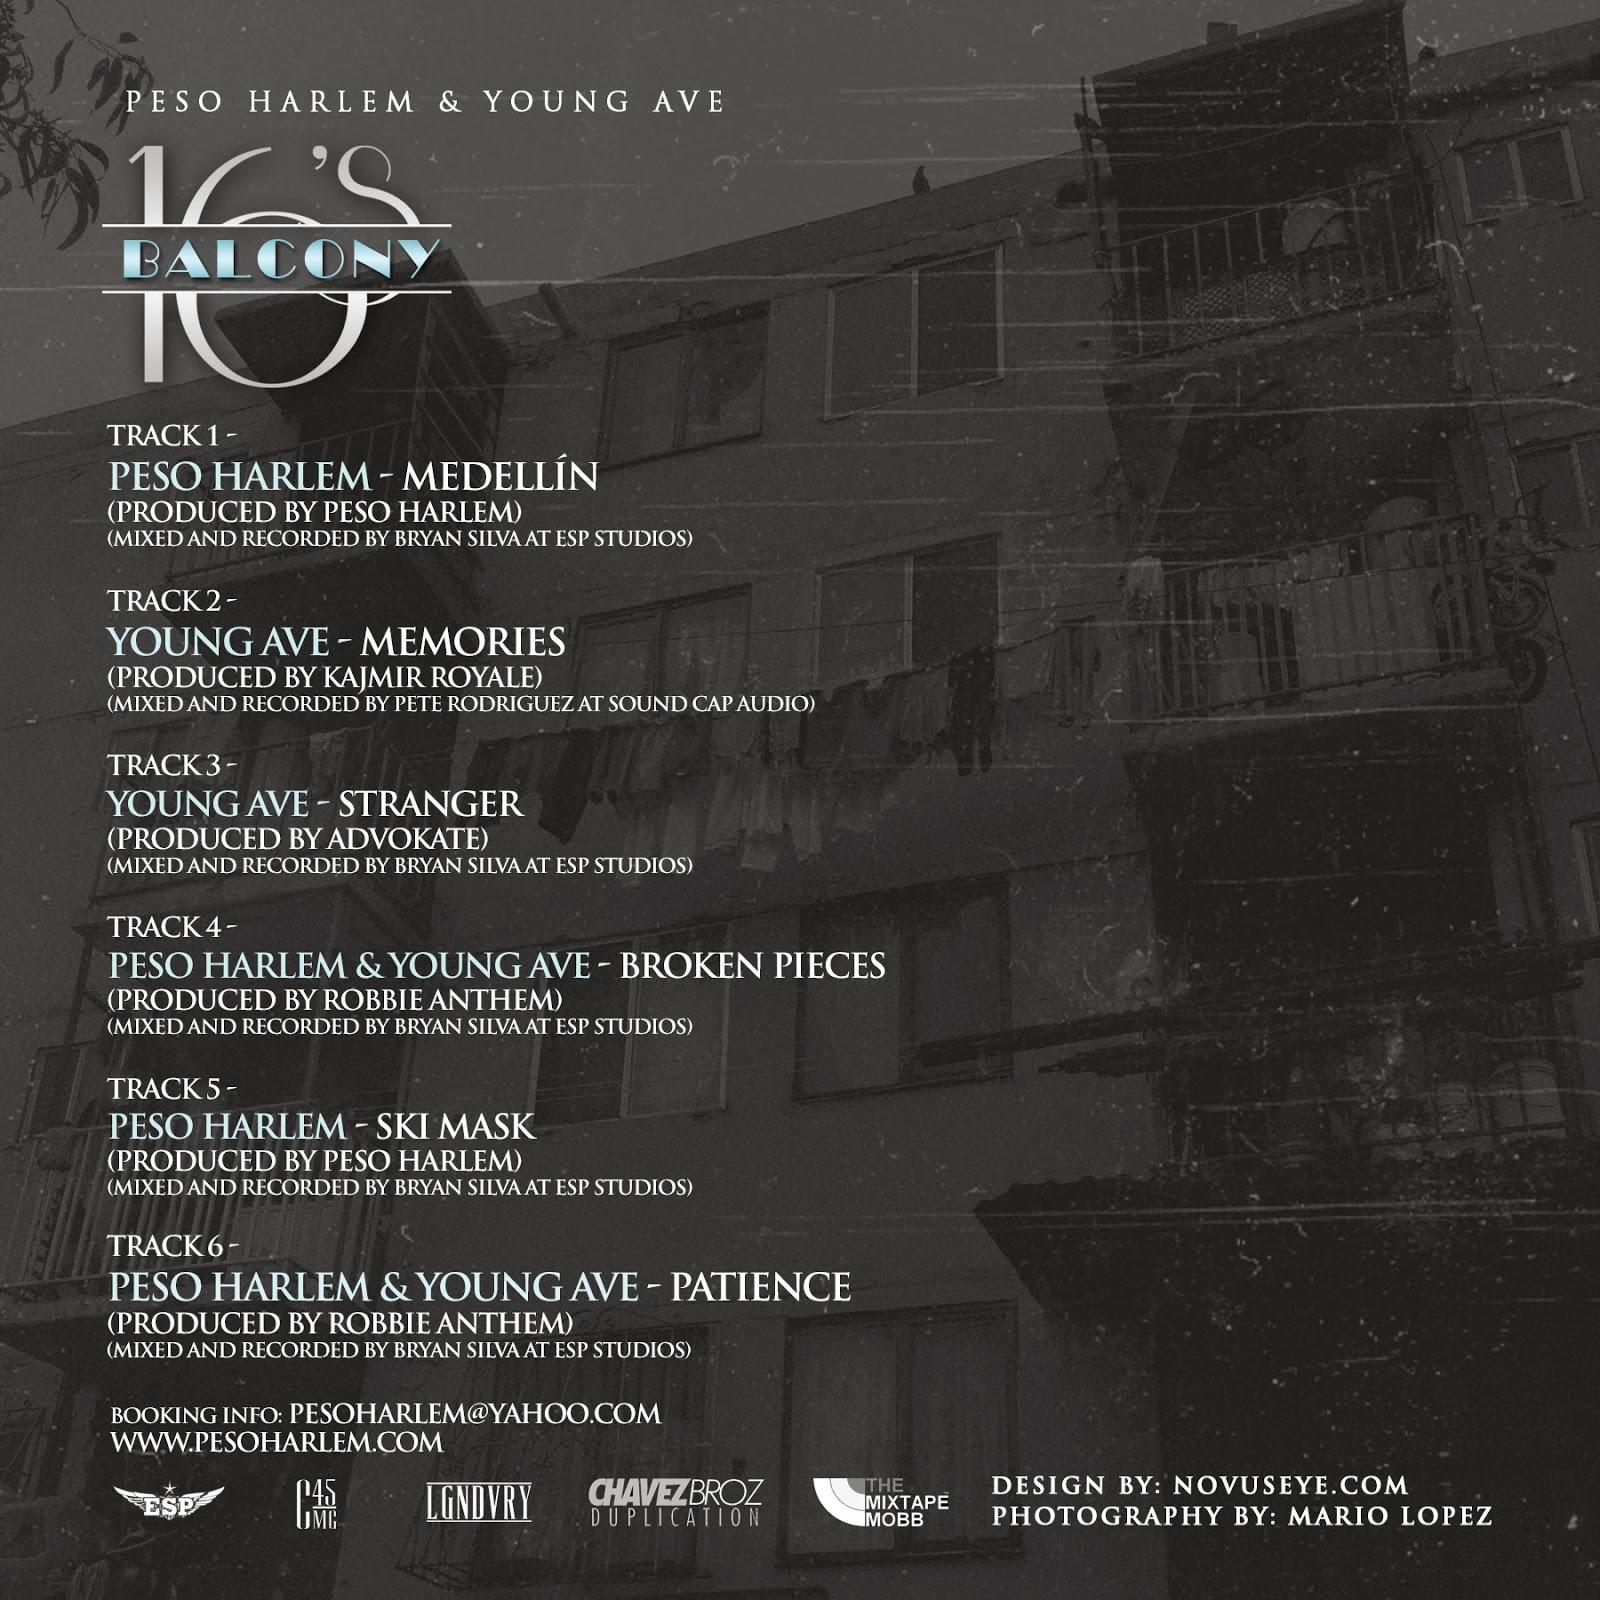 peso-harlem-young-ave-balcony-16-tracklist